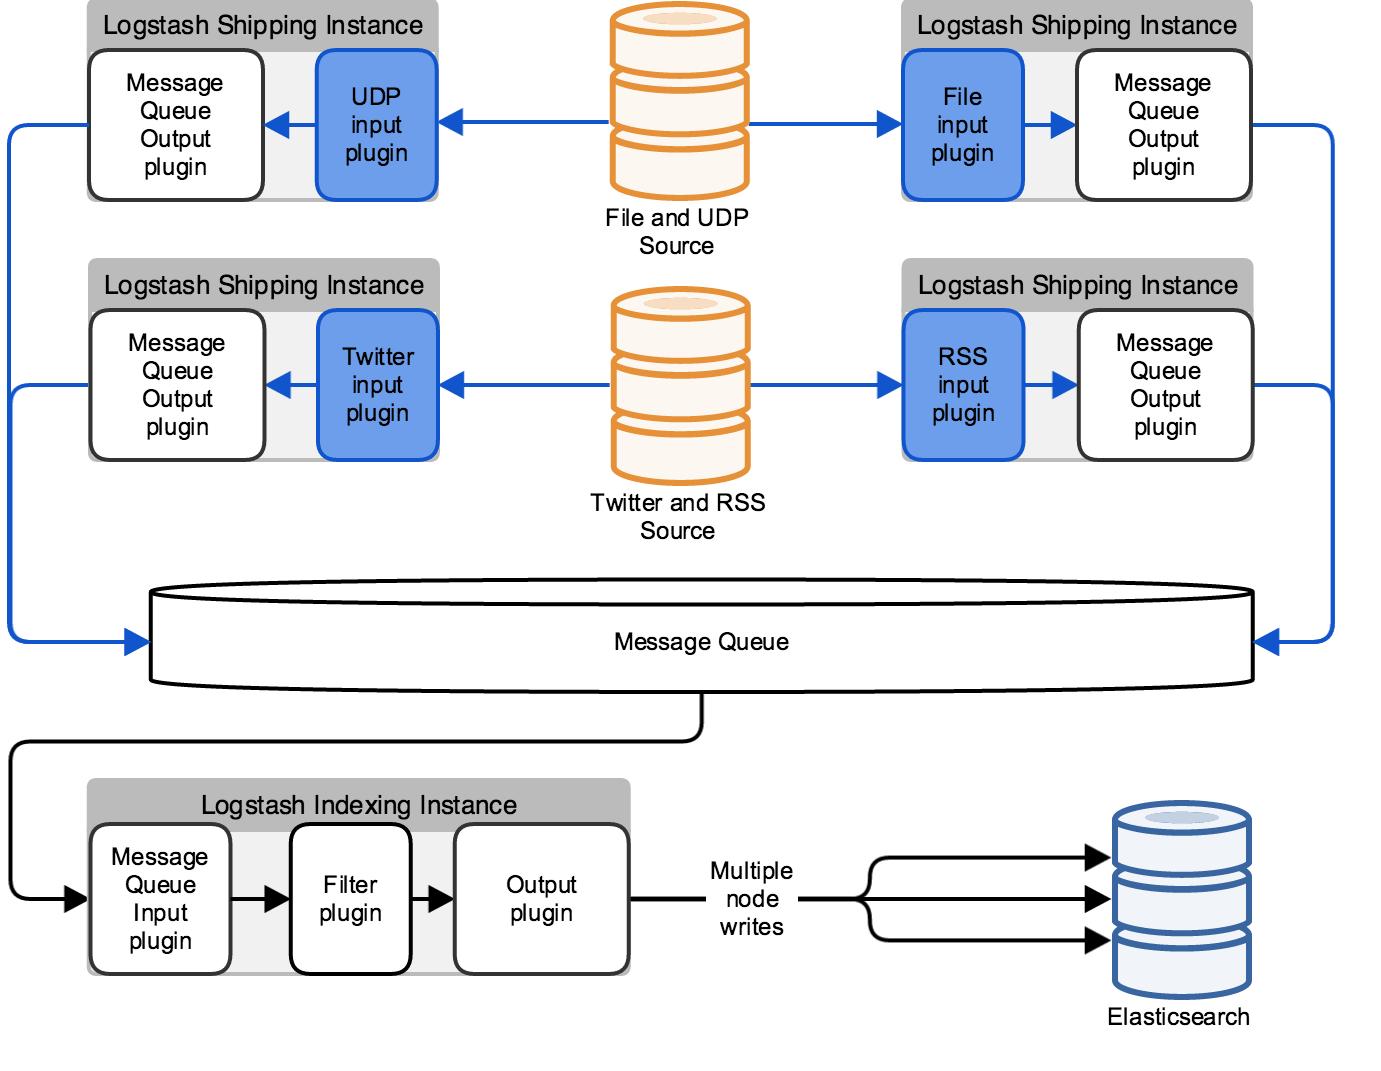 Deploying and Scaling Logstash | Logstash Reference [1 5] | Elastic